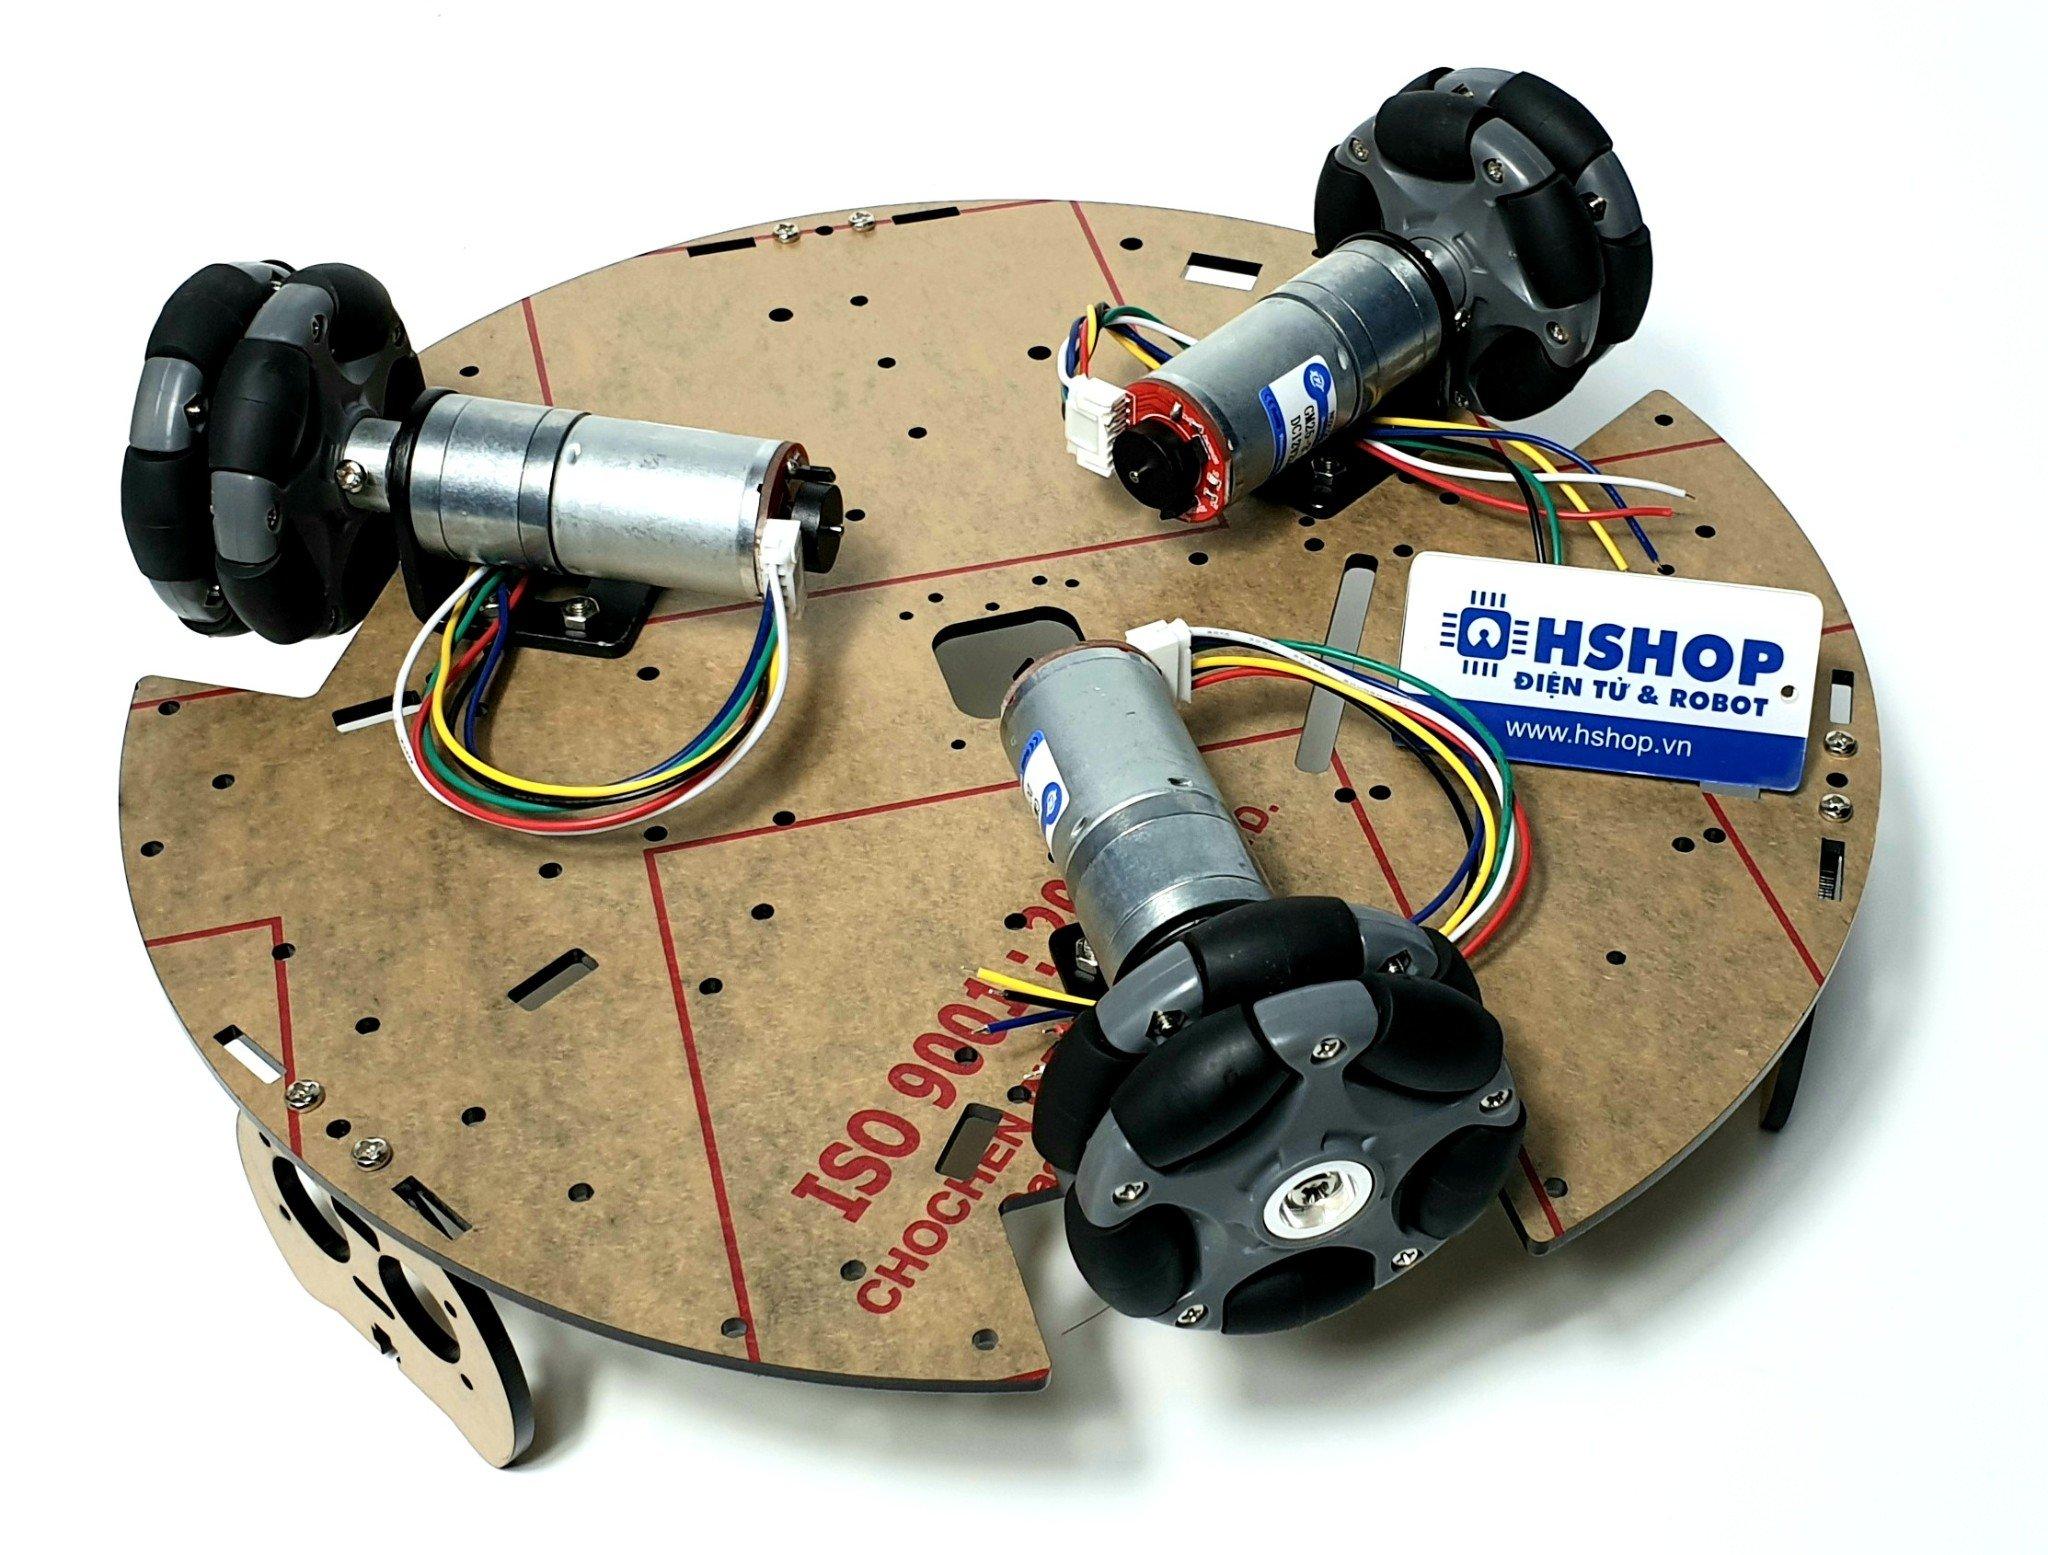 Khung xe Robot Chasiss 3HM Omni Wheel